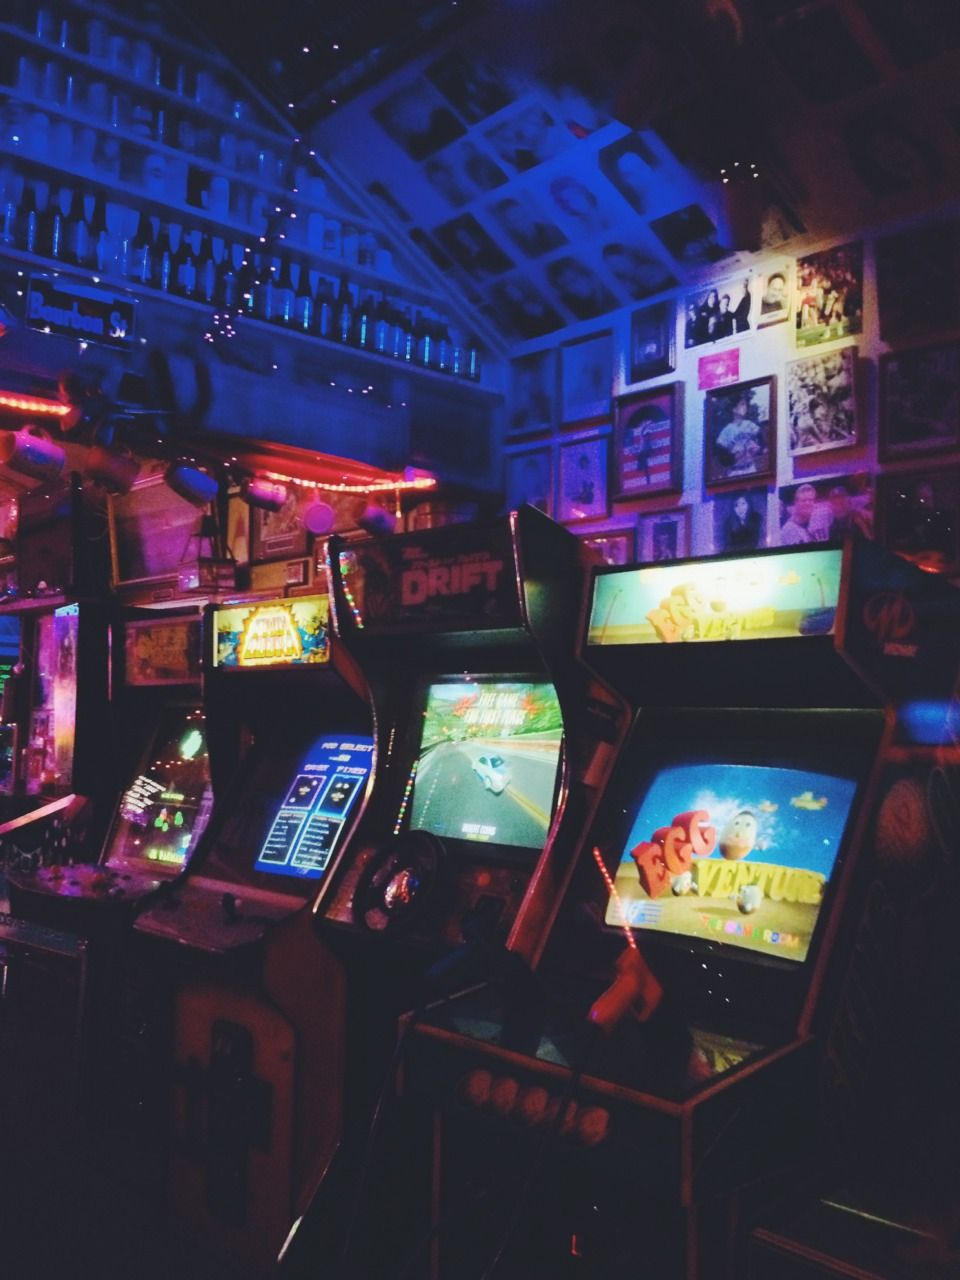 Cyberpunk Noise Photo Neon Aesthetic Arcade 80s Aesthetic